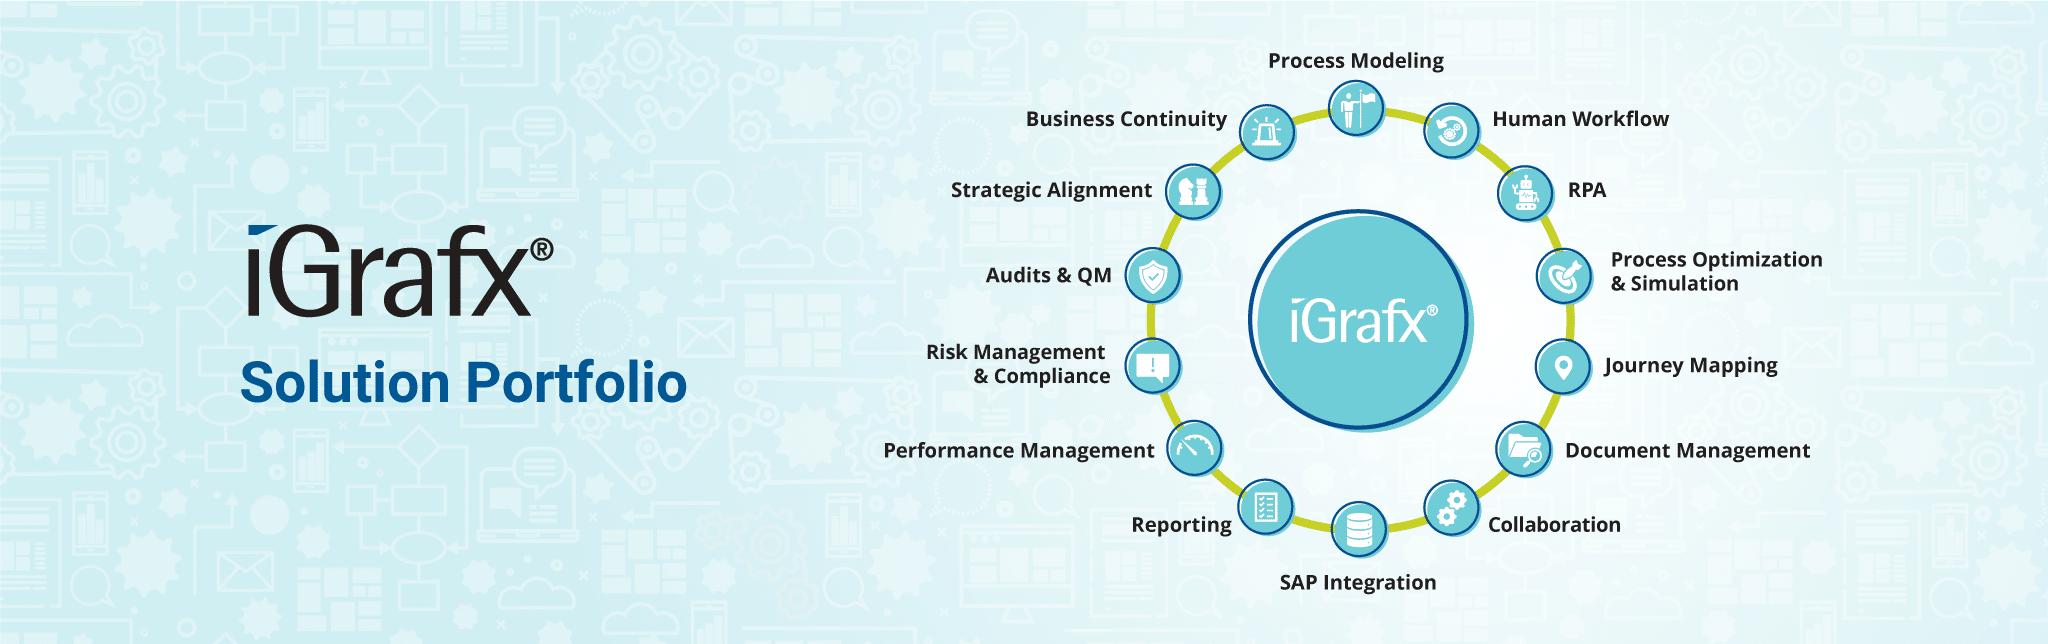 iGrafx BPM solution portfolio graphic